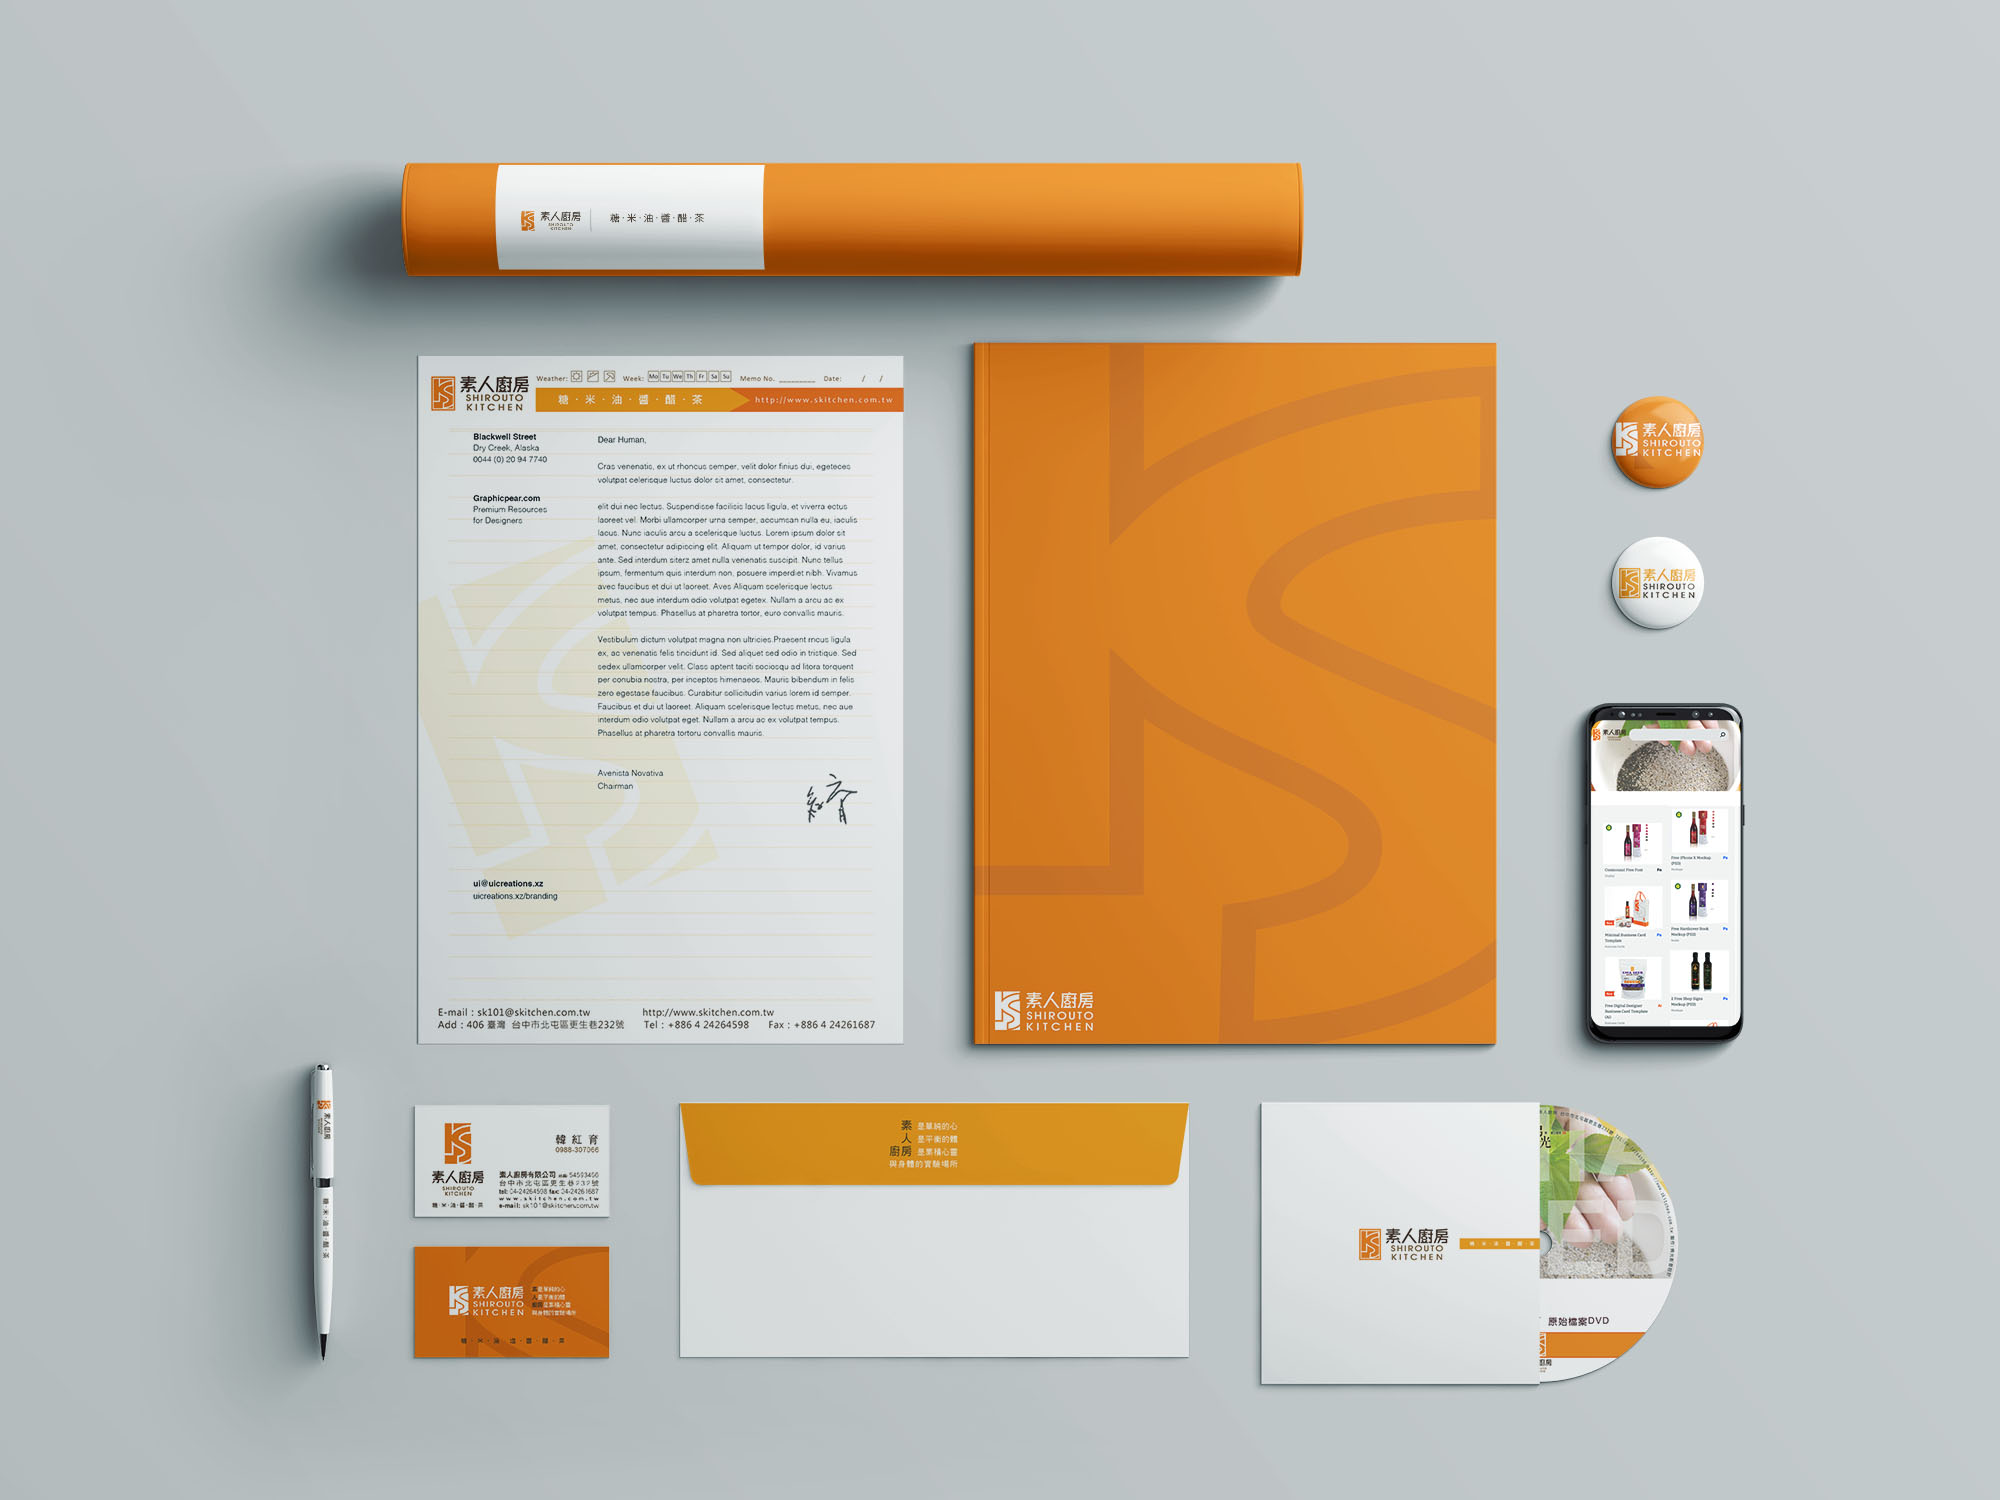 CIS設計-素人廚房_信封+信套+名片+筆+CD+RWD